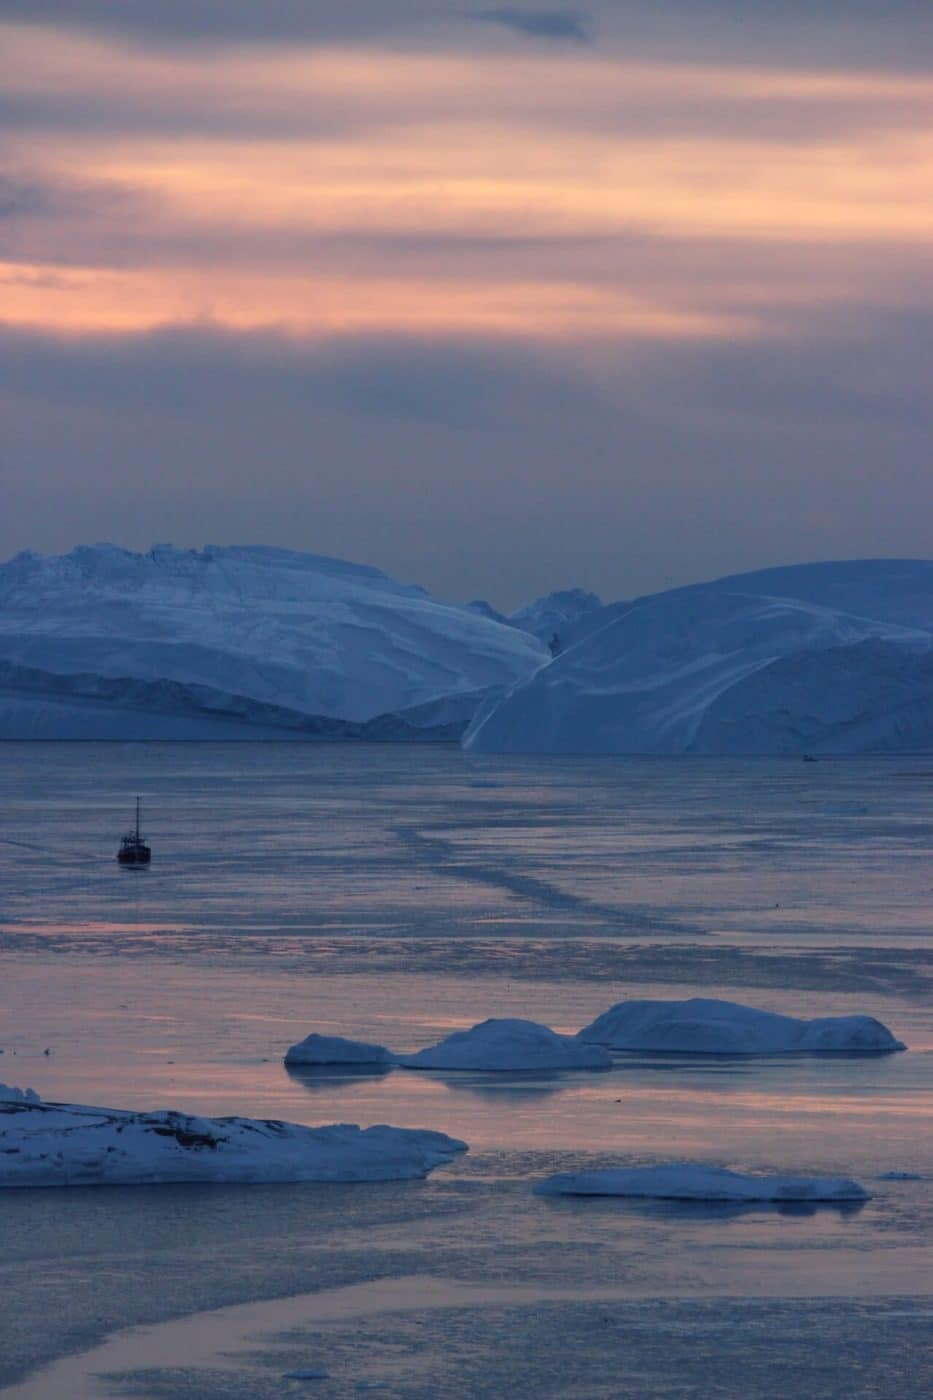 Hotel Arctic sunset. Ilulissat. Photo by Vibha Dania-Dhawan